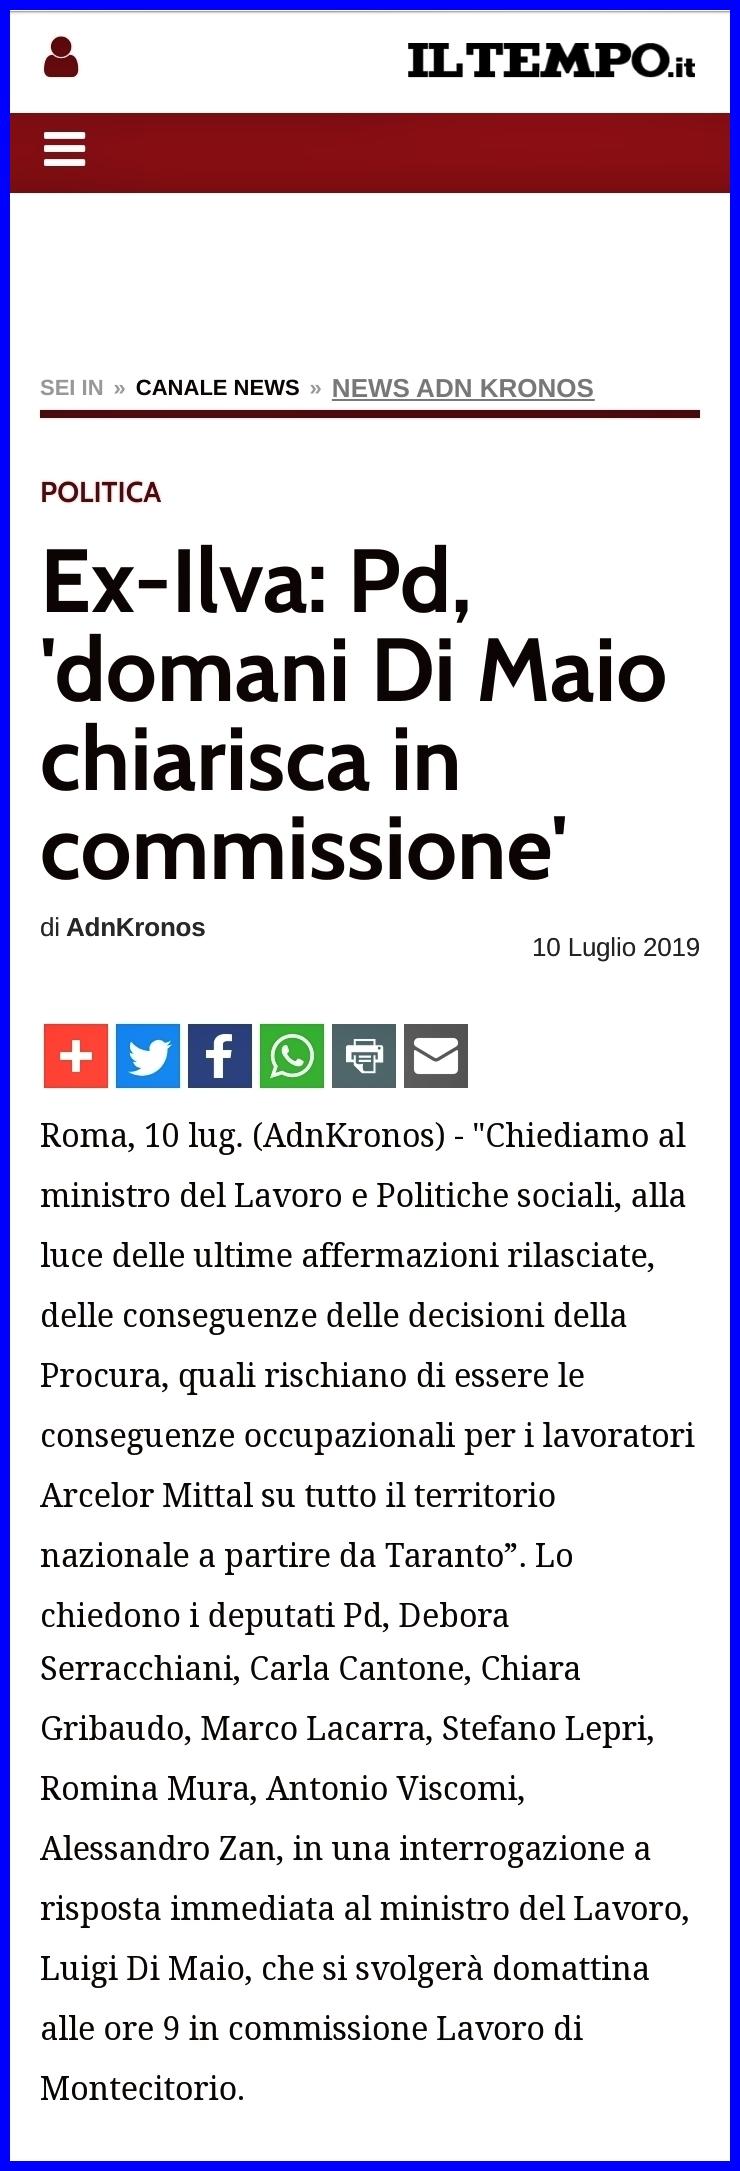 "EX-Ilva. Pd: ""Di Maio chiarisca in commissione"". - Romina Mura"